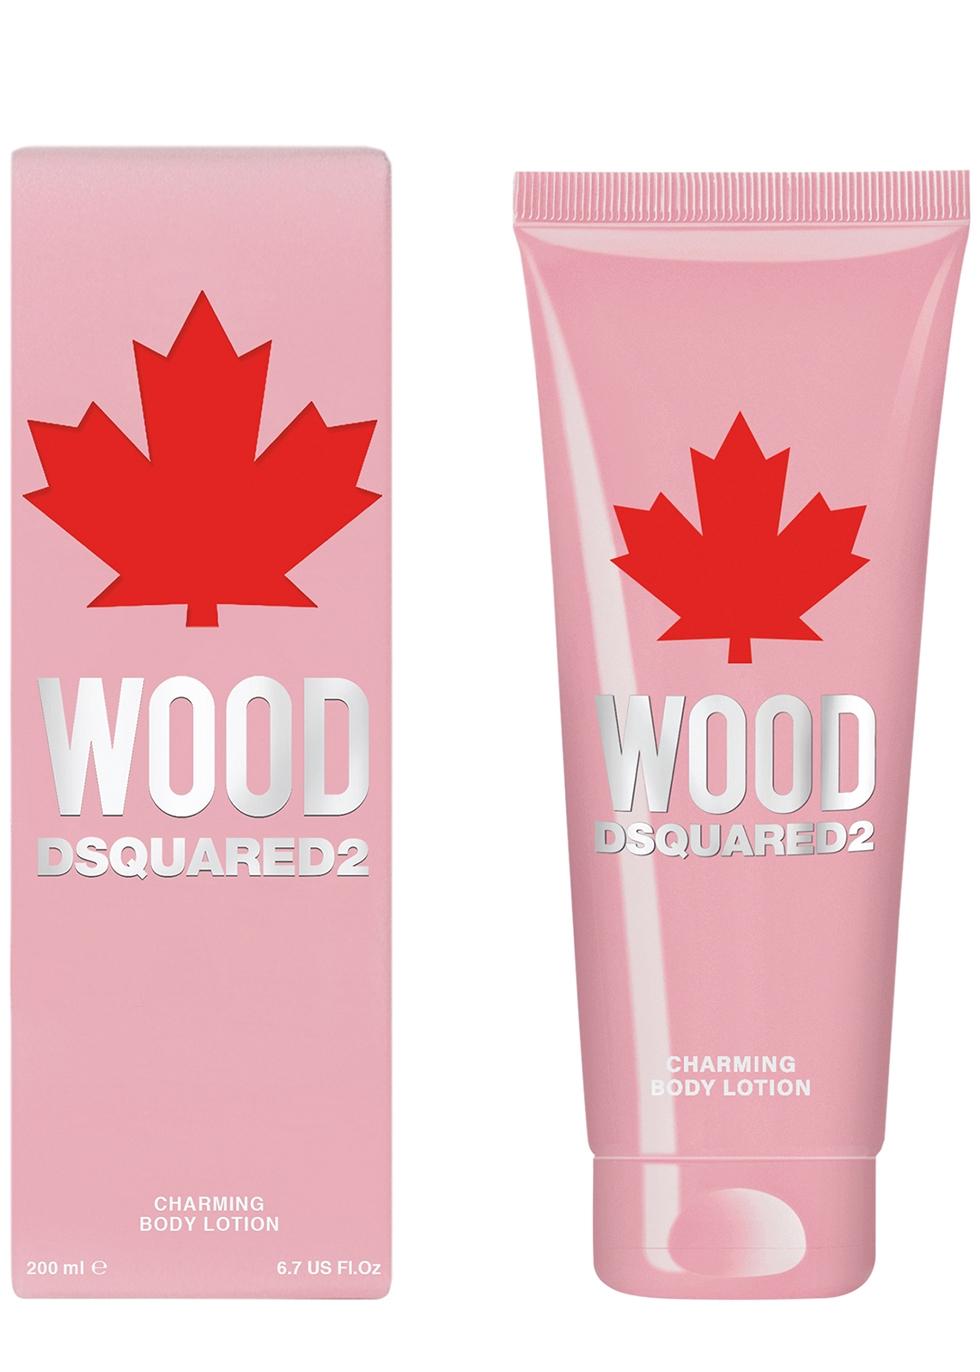 Wood Pour Femme Body Lotion 200ml - Dsquared2